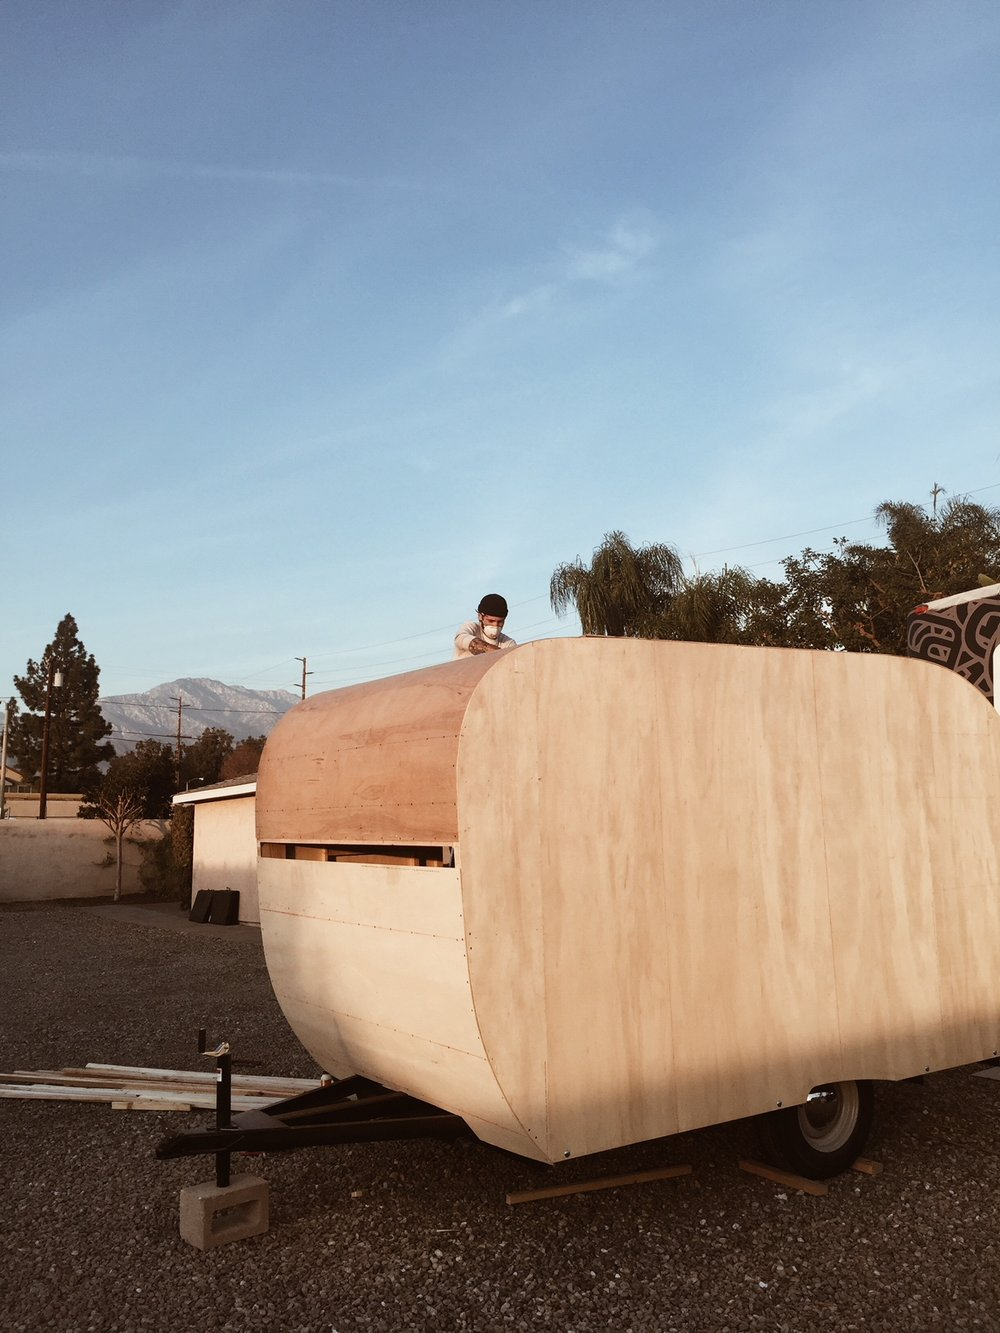 vintage-camper-build3.JPG